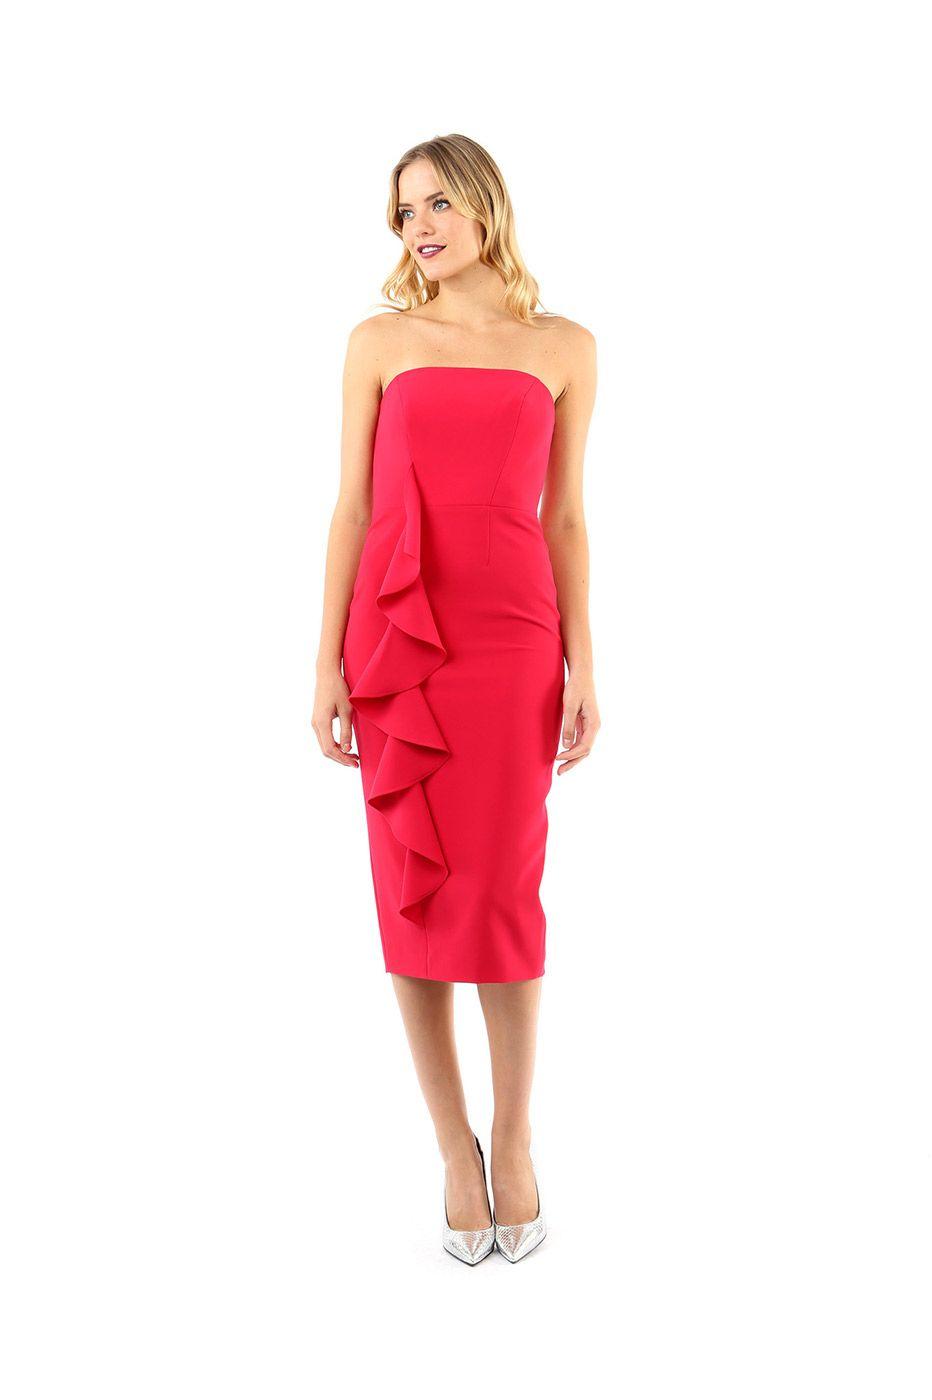 Midi Classic Dresses